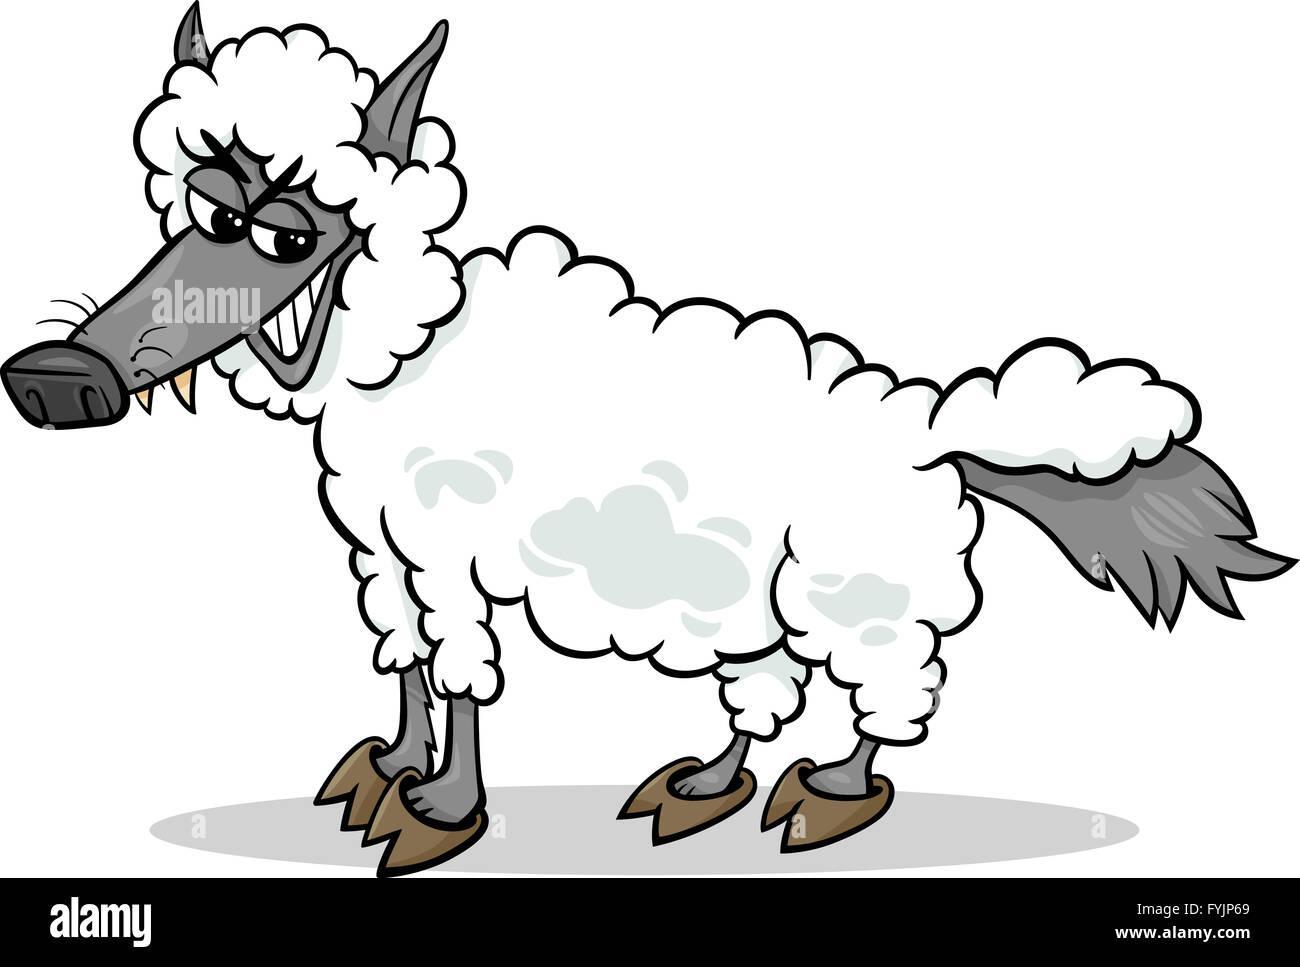 Lobo Vestido De Oveja En Cartoon Foto Imagen De Stock